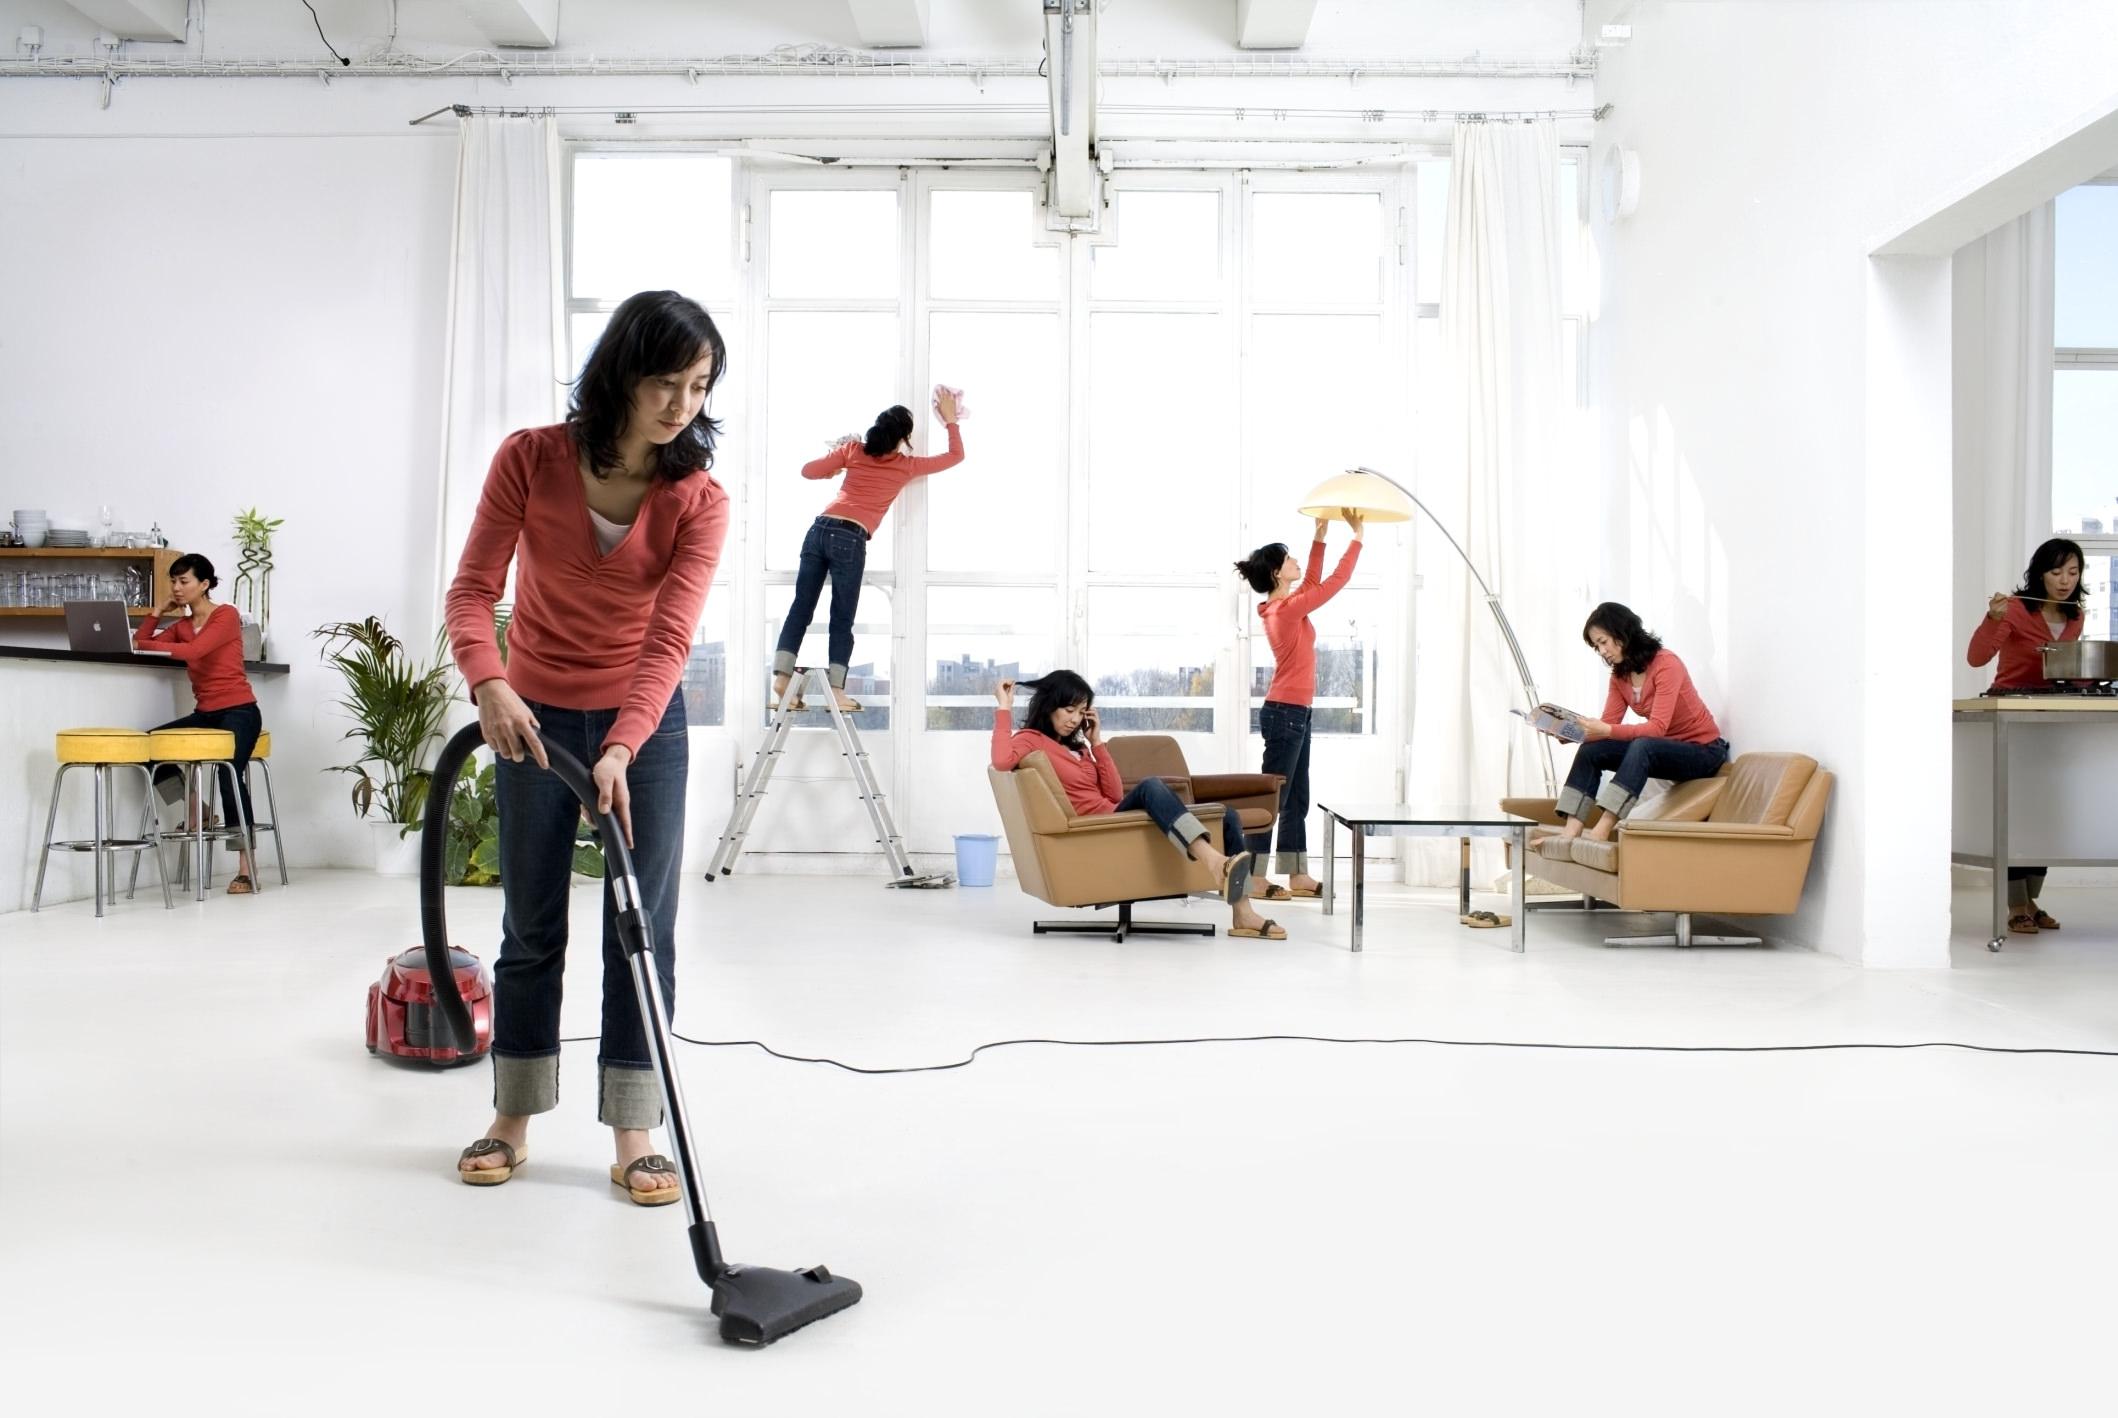 уборка дома, квартиры, кто должен убирать